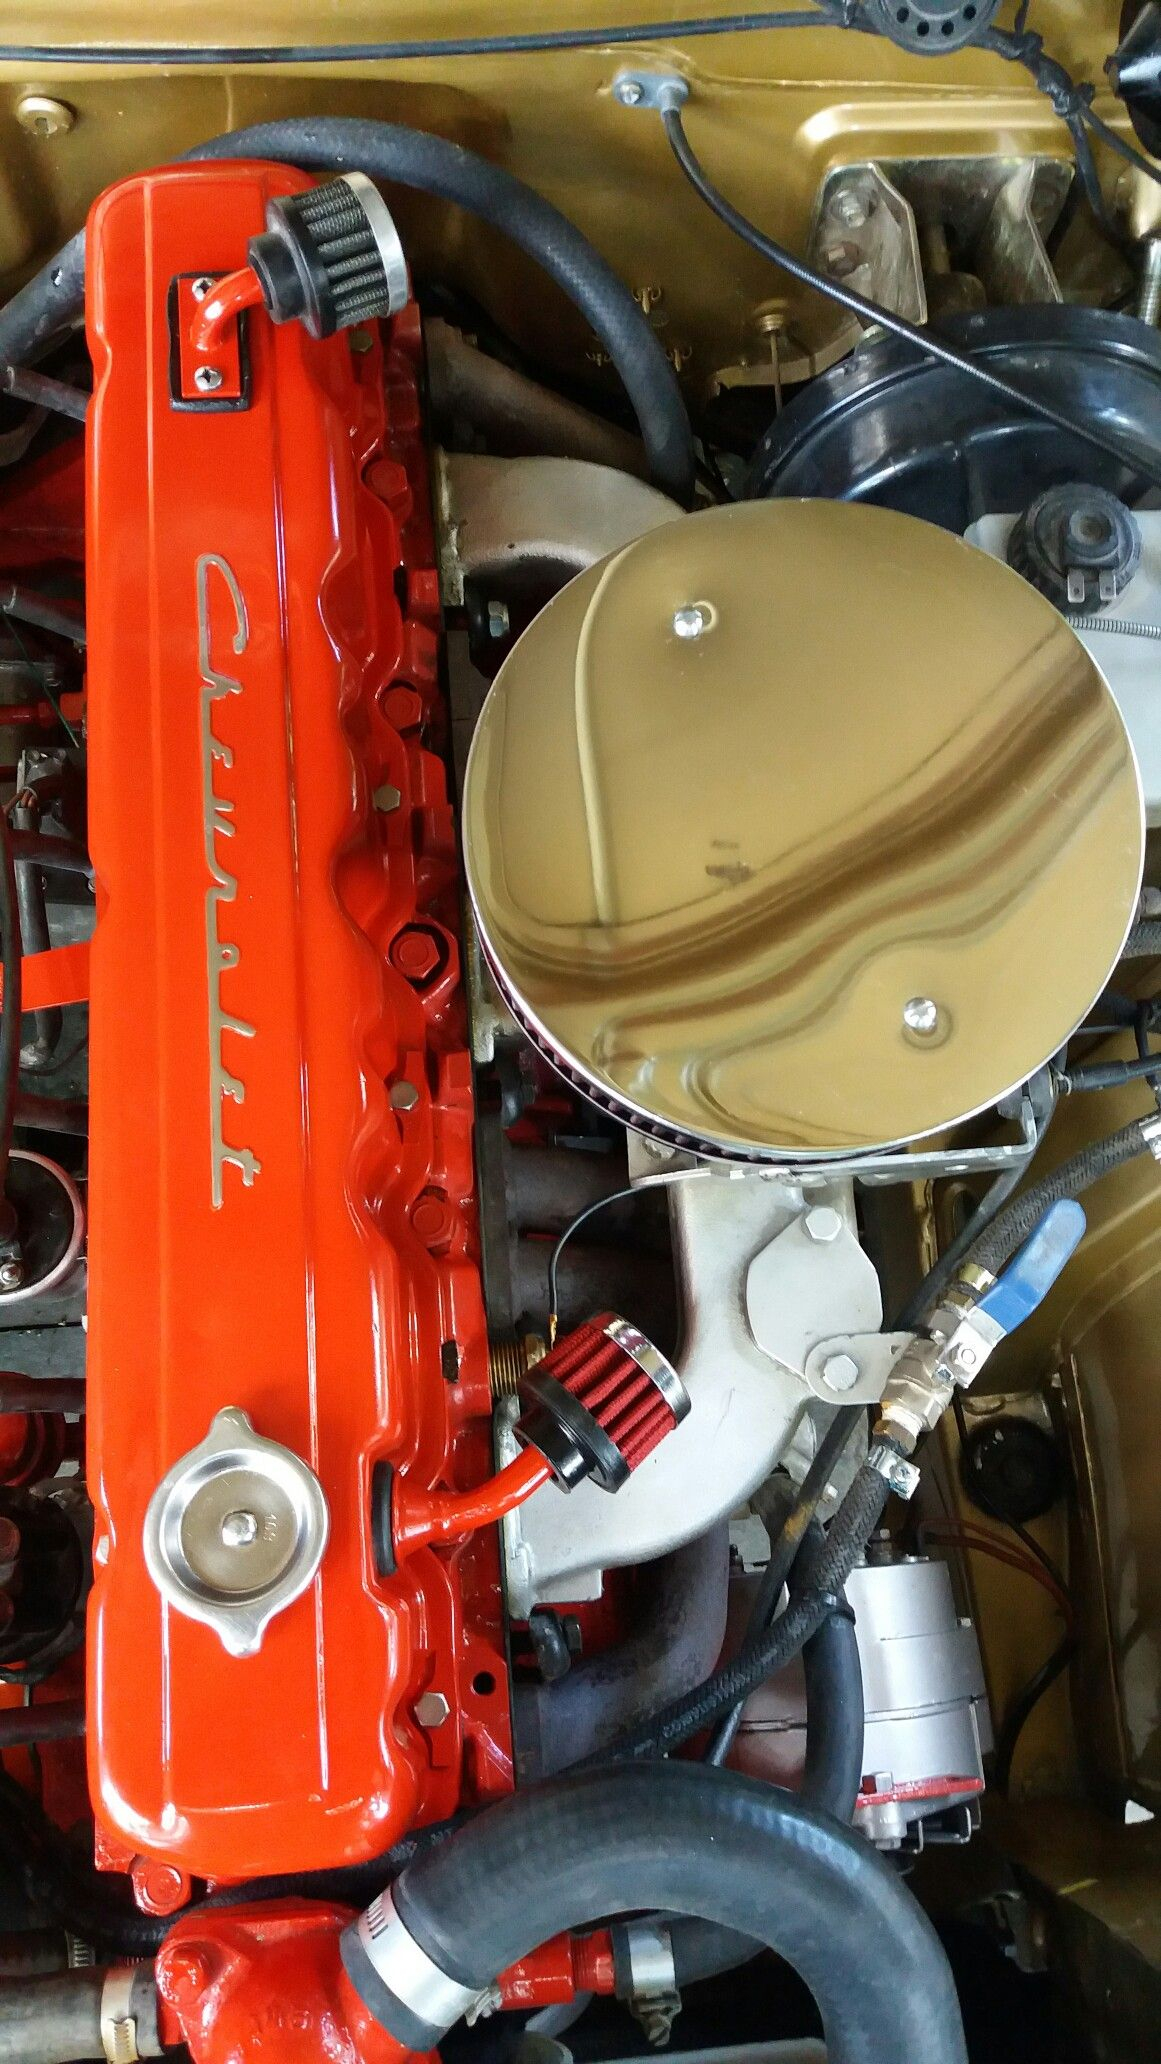 Chevrolet straight-6 | Cars & Transportation | 57 chevy trucks